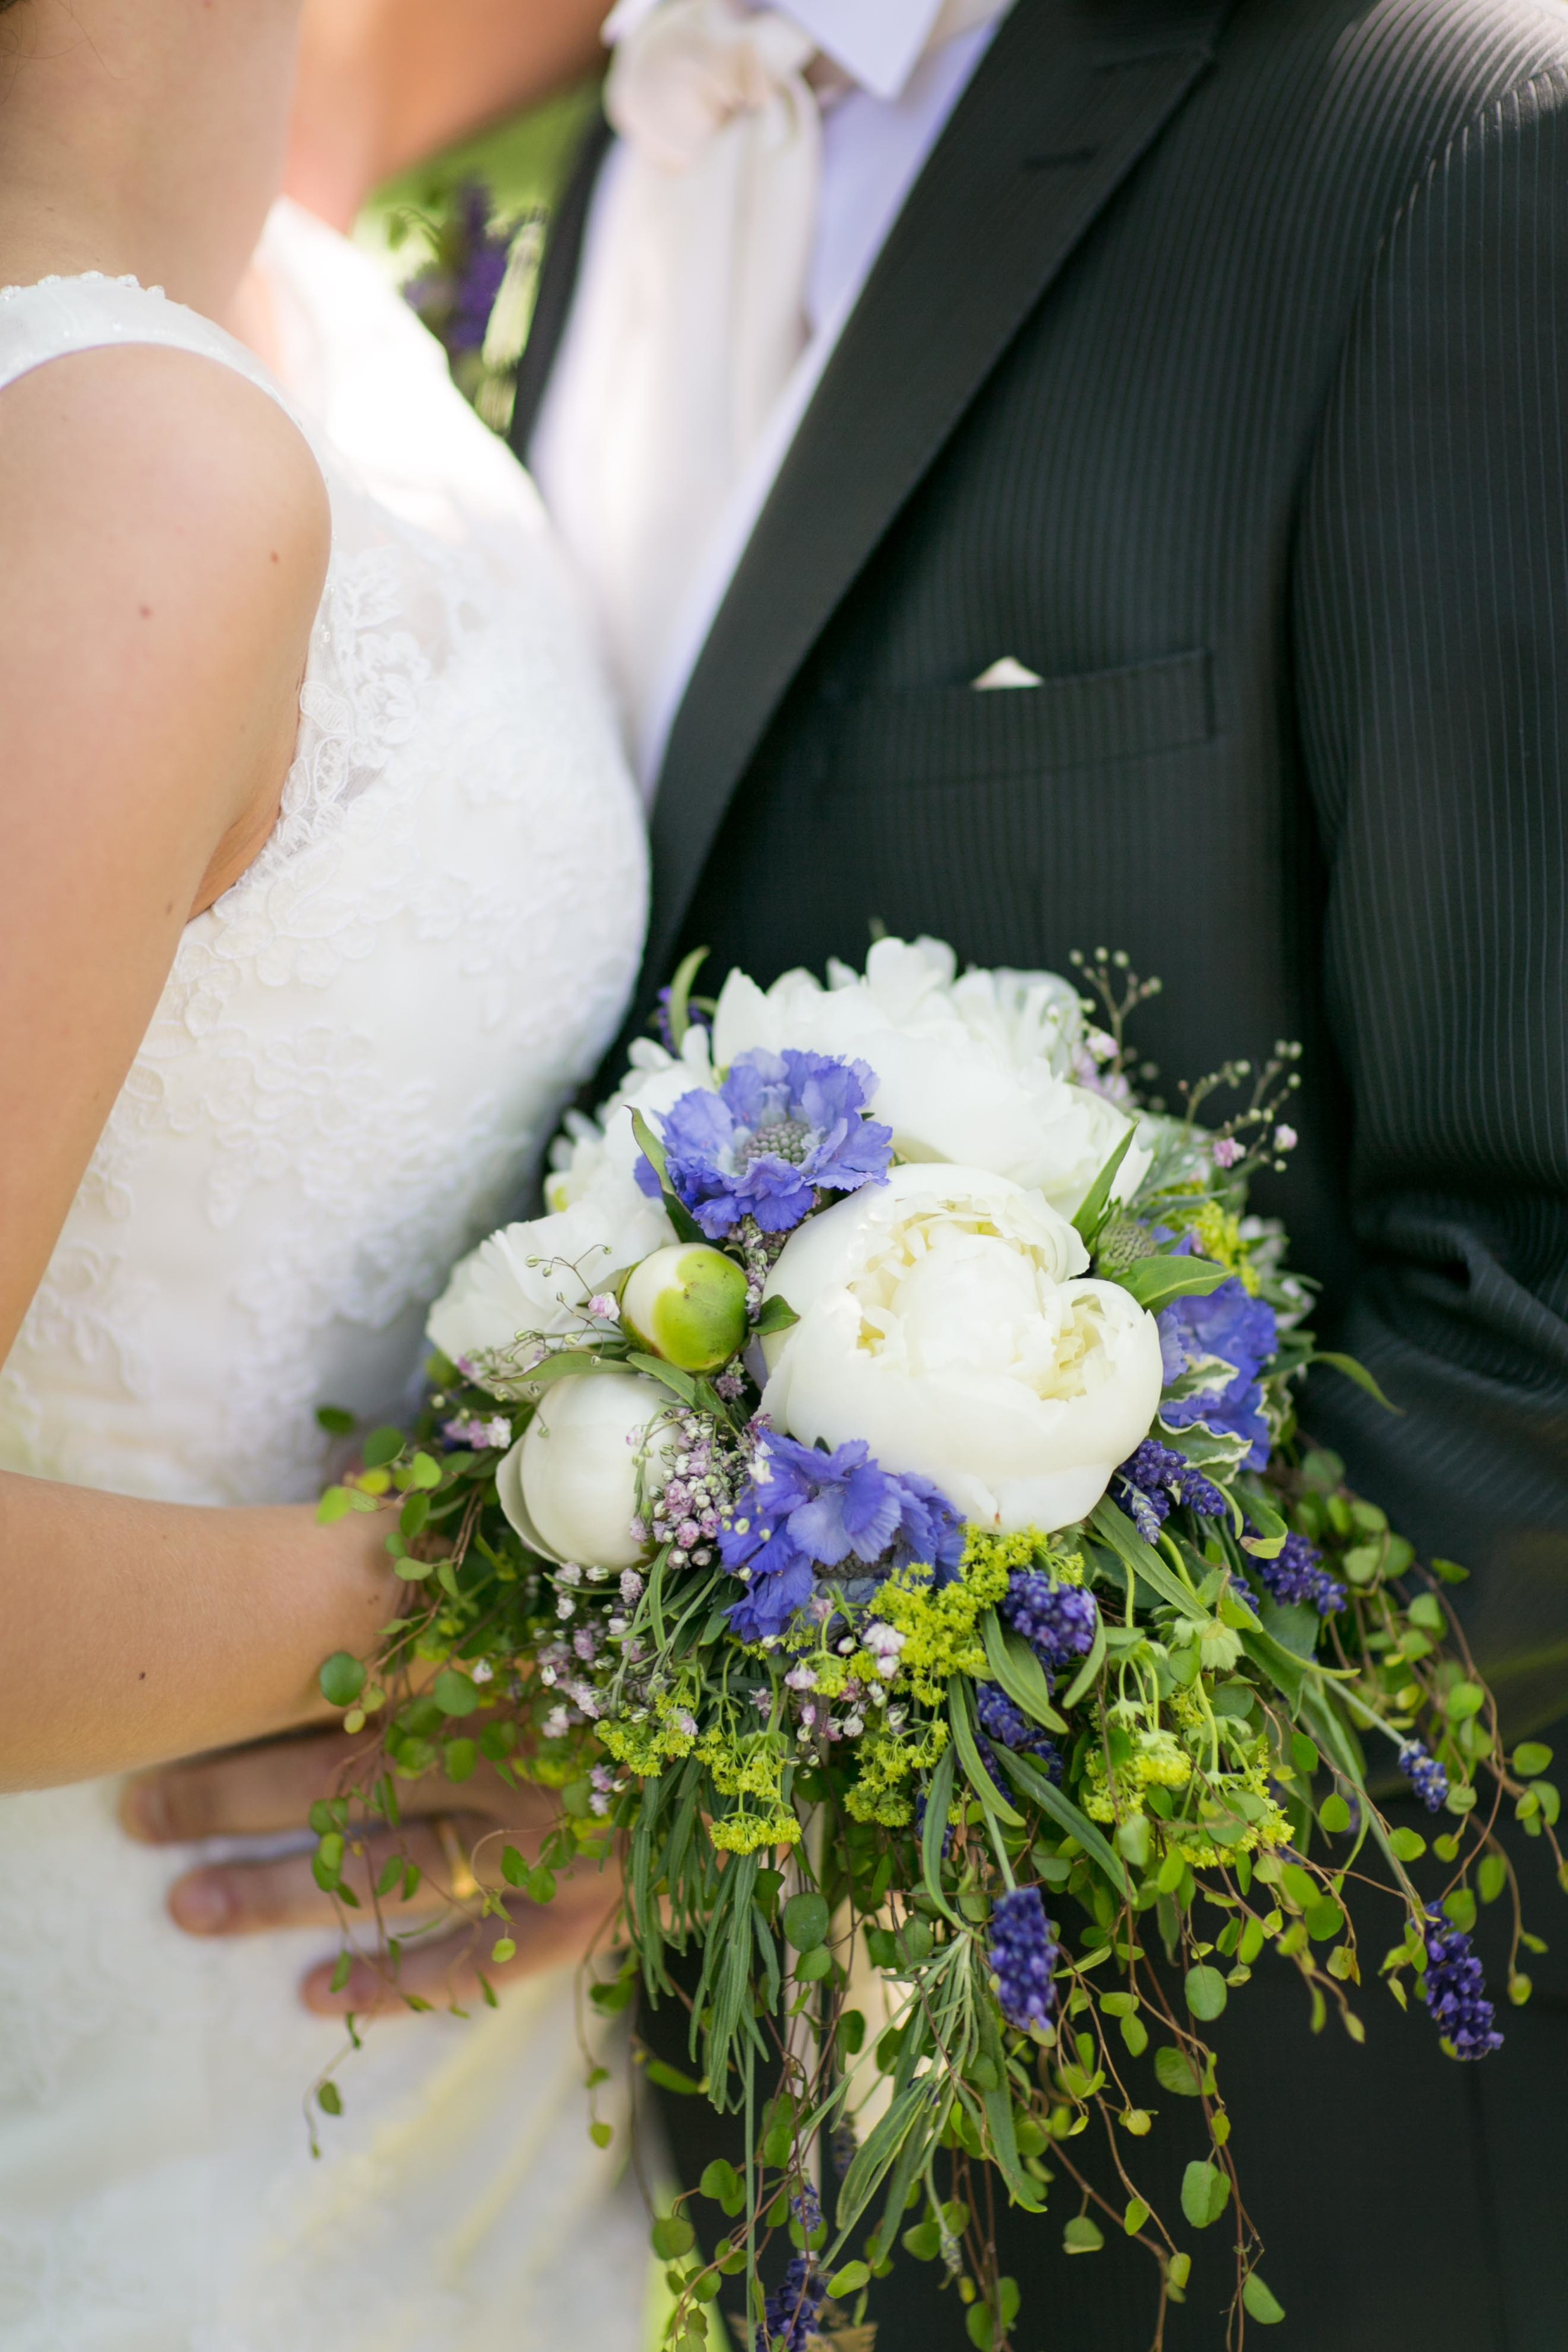 Hochzeitsfotografie Berlin_Fran Burrows Fotografie-191.jpg